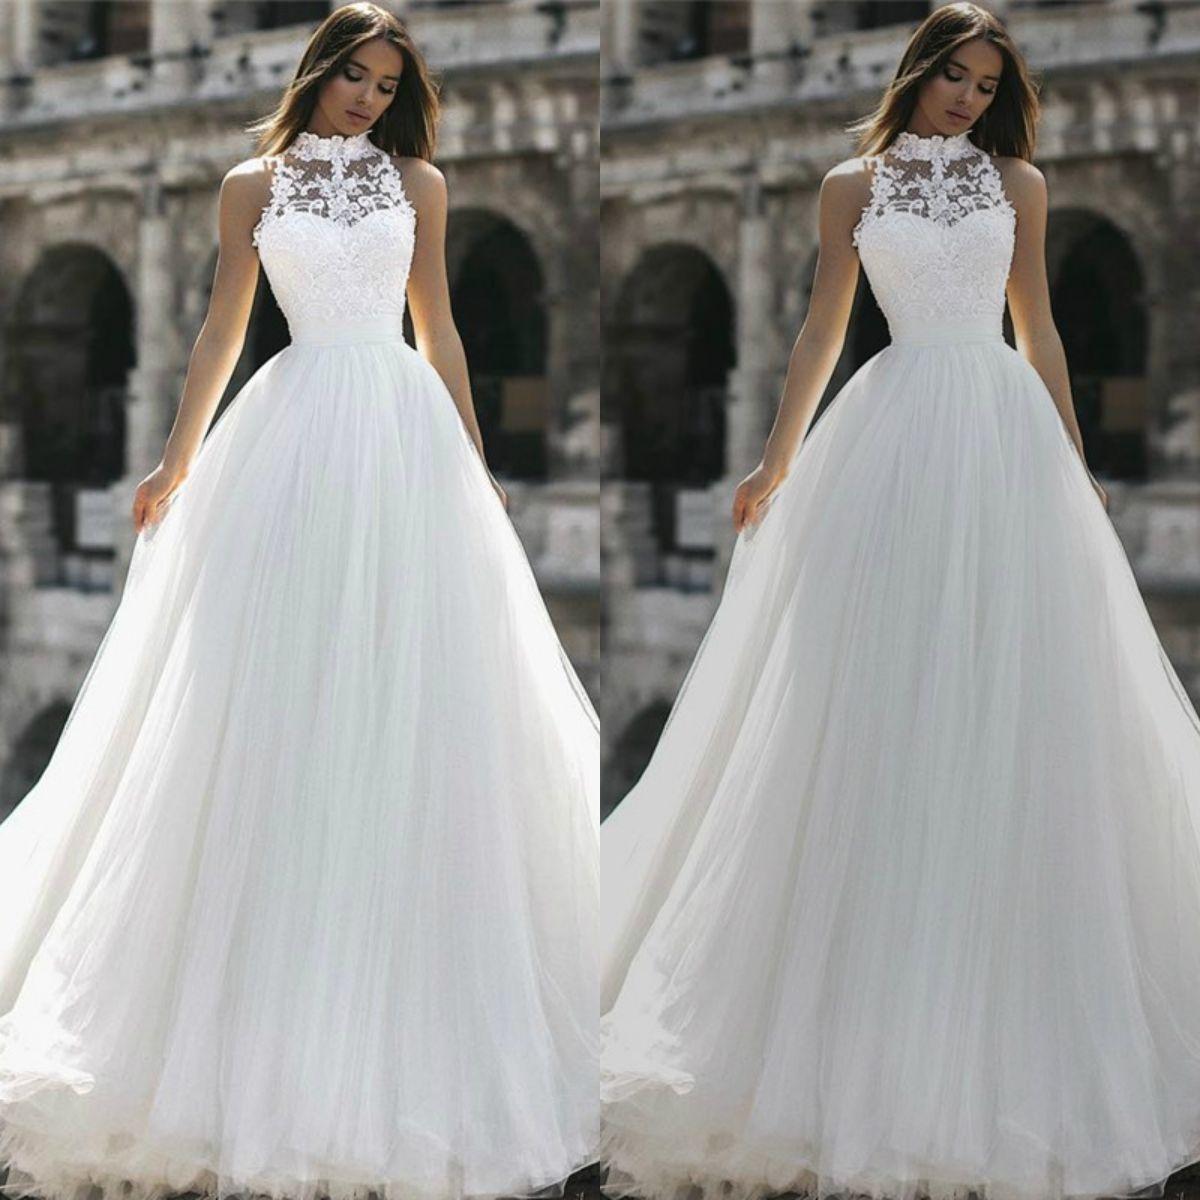 51ab707a6d Discount Berta 2019 A Line Beach Wedding Dresses High Neck Lace Sleeveless  Tulle Sweep Train Bridal Gowns Behemia Boho Wedding Gown Vestido De Novia  Wedding ...